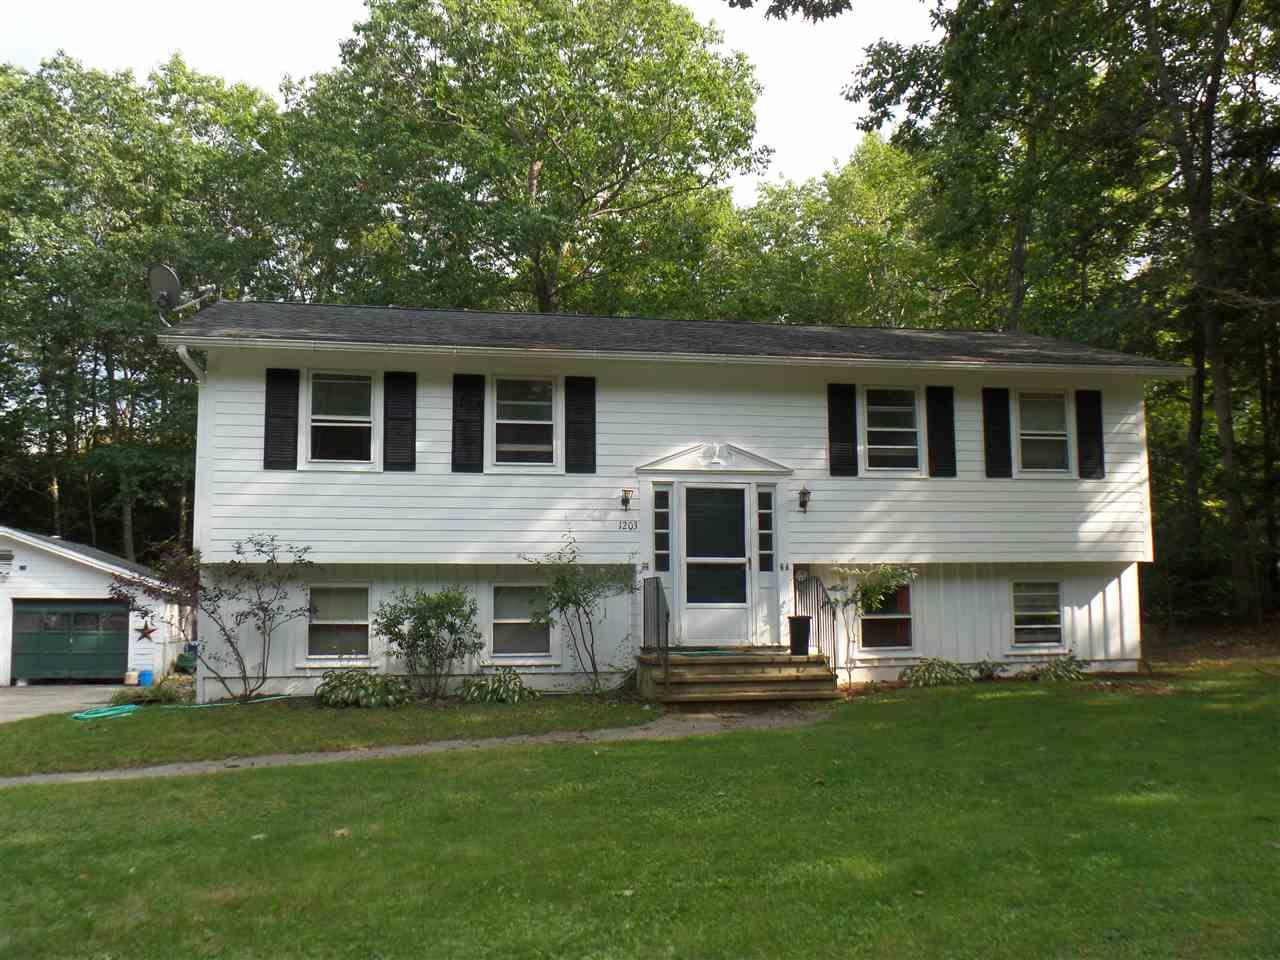 BARNSTEAD NHMulti Family Homes for sale